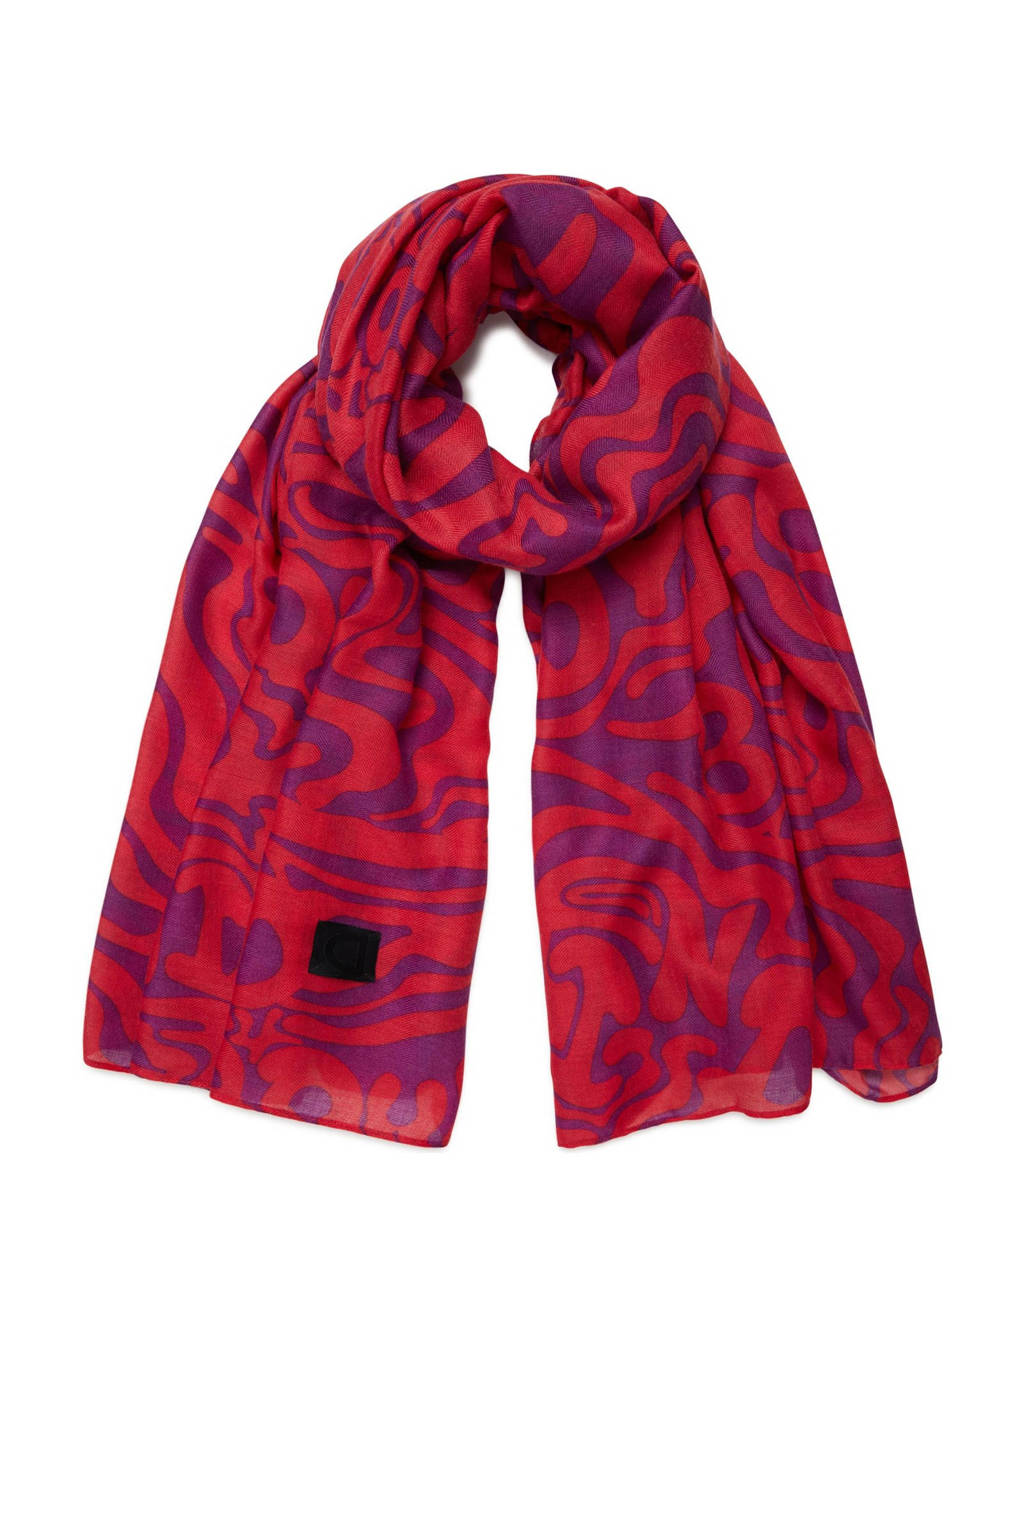 Desigual sjaal rood/paars, Rood/paars